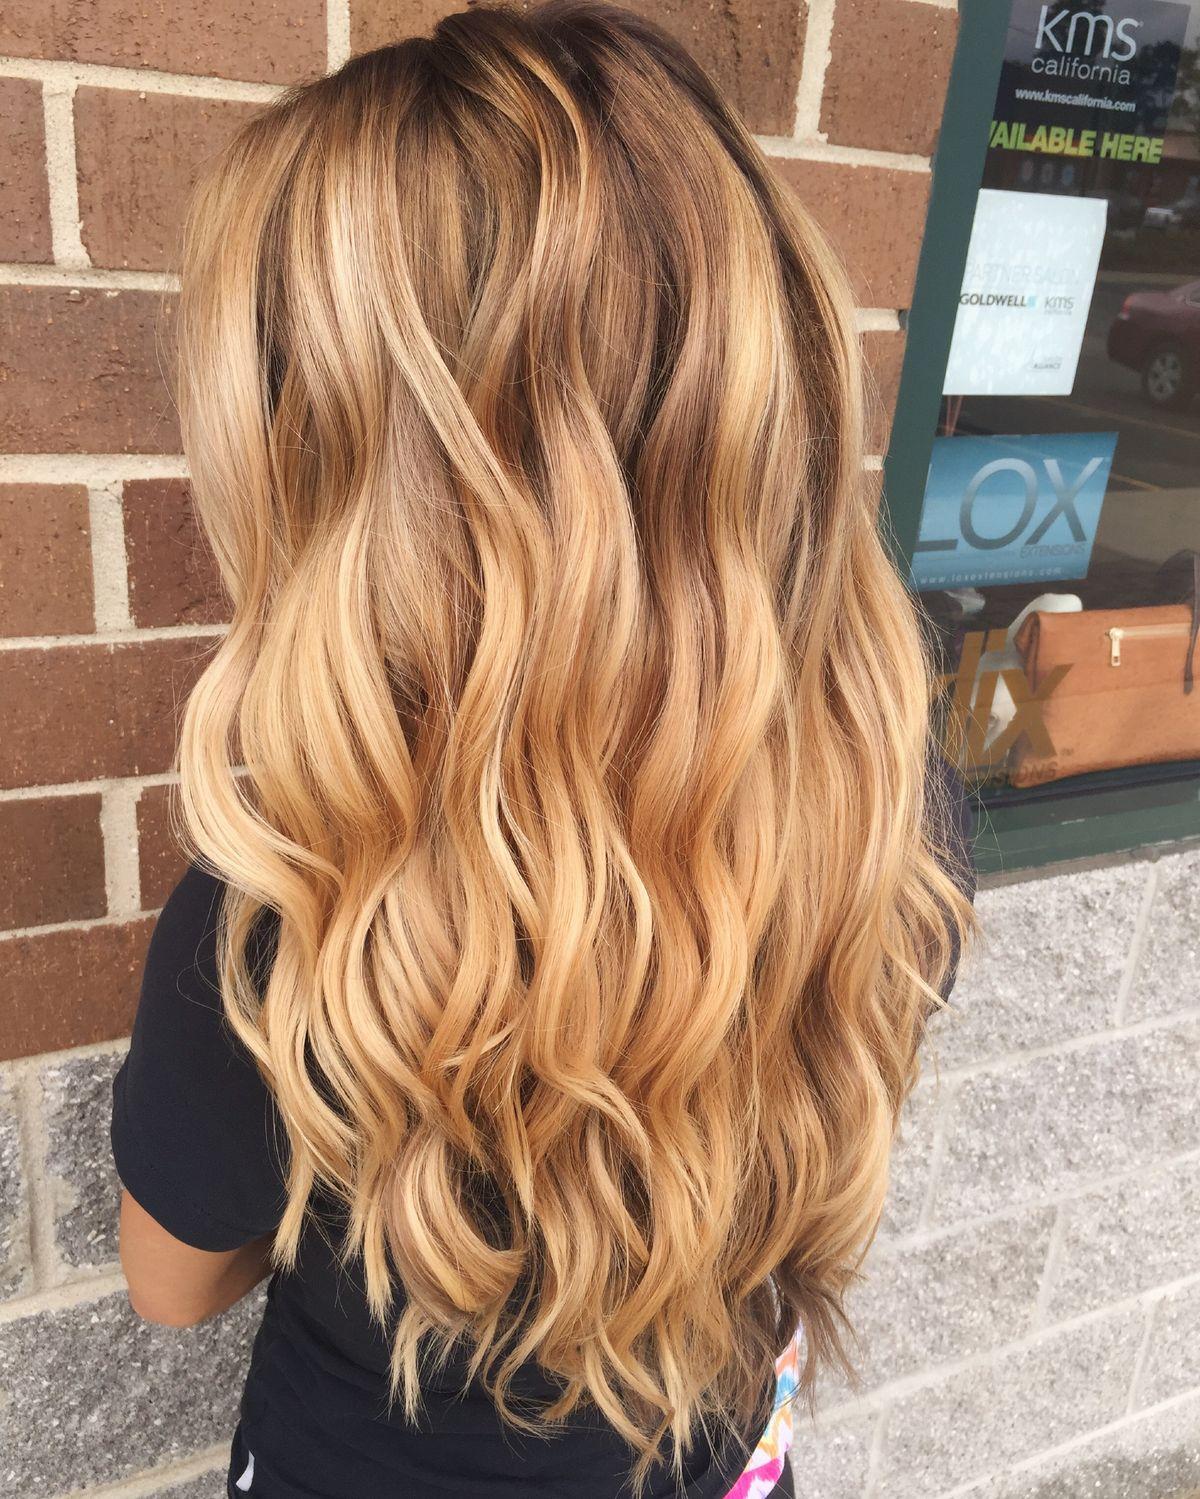 Pretty blonde waves! Blonde hair color, women's hair, women's hairstyles, beach waves, golden blonde, summer hair, summer style. #hair